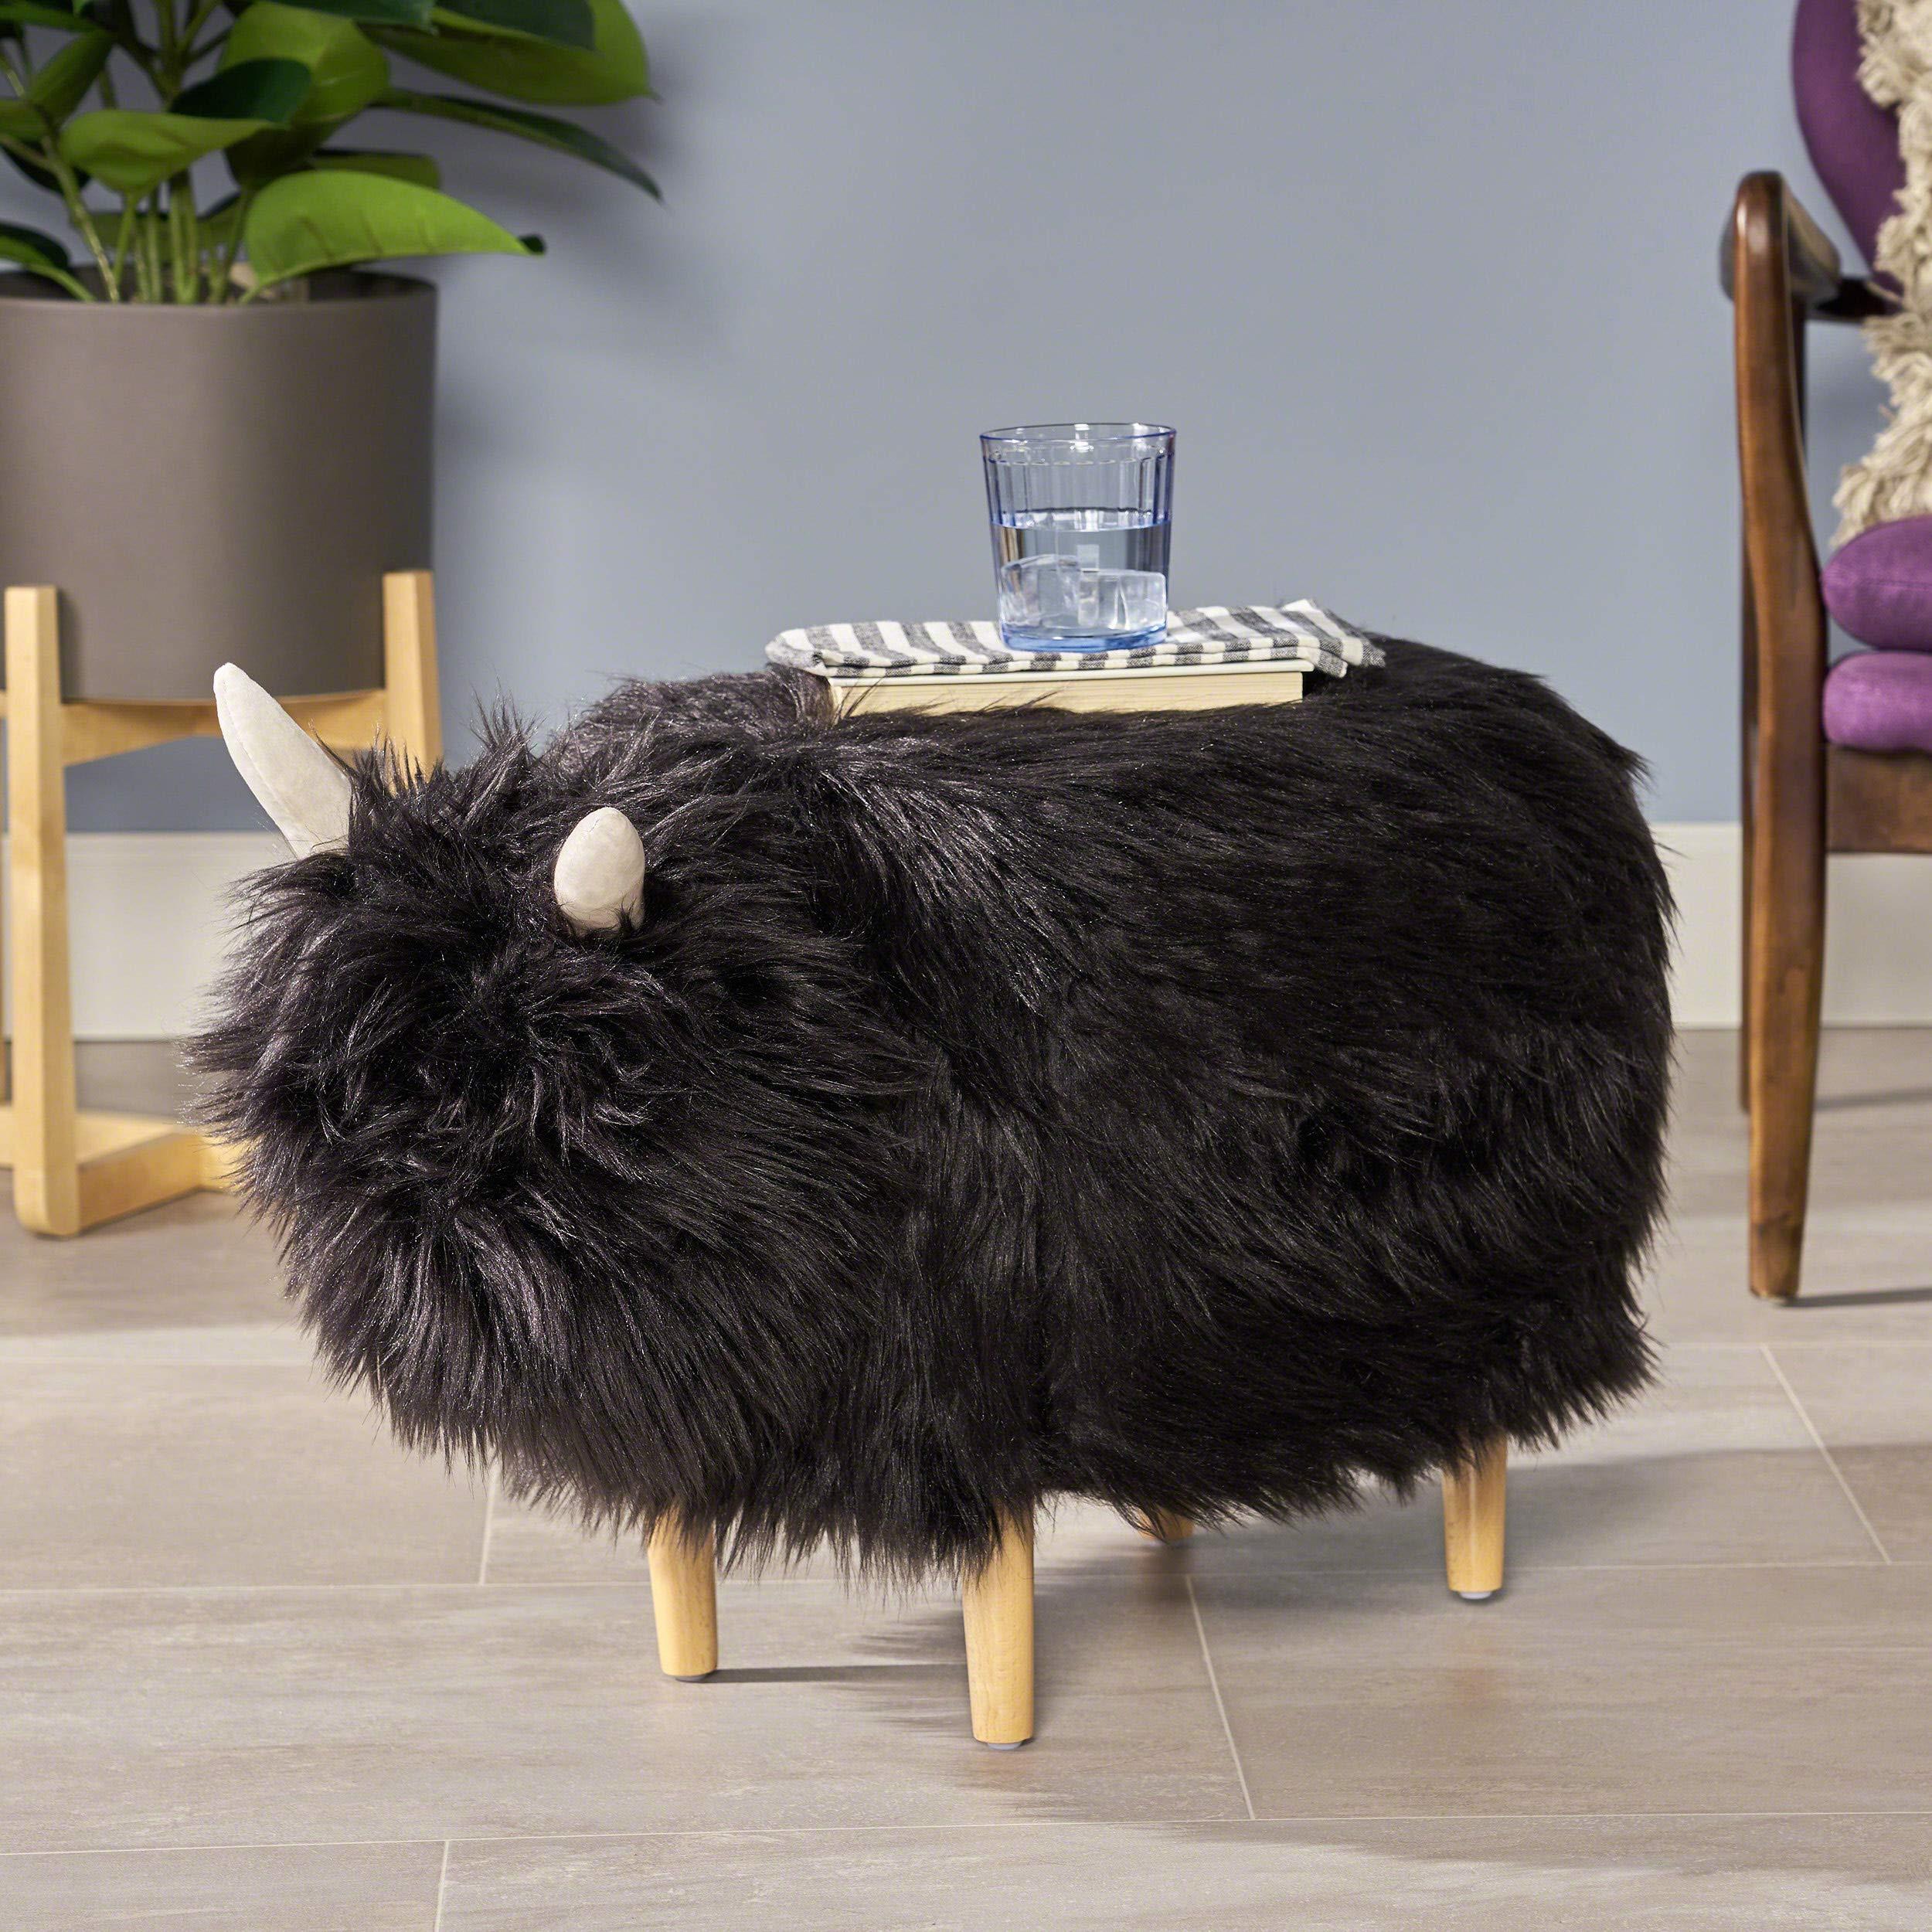 Christopher Knight Home Kamla Furry Yak Ottoman, Black, Natural Finish by Christopher Knight Home